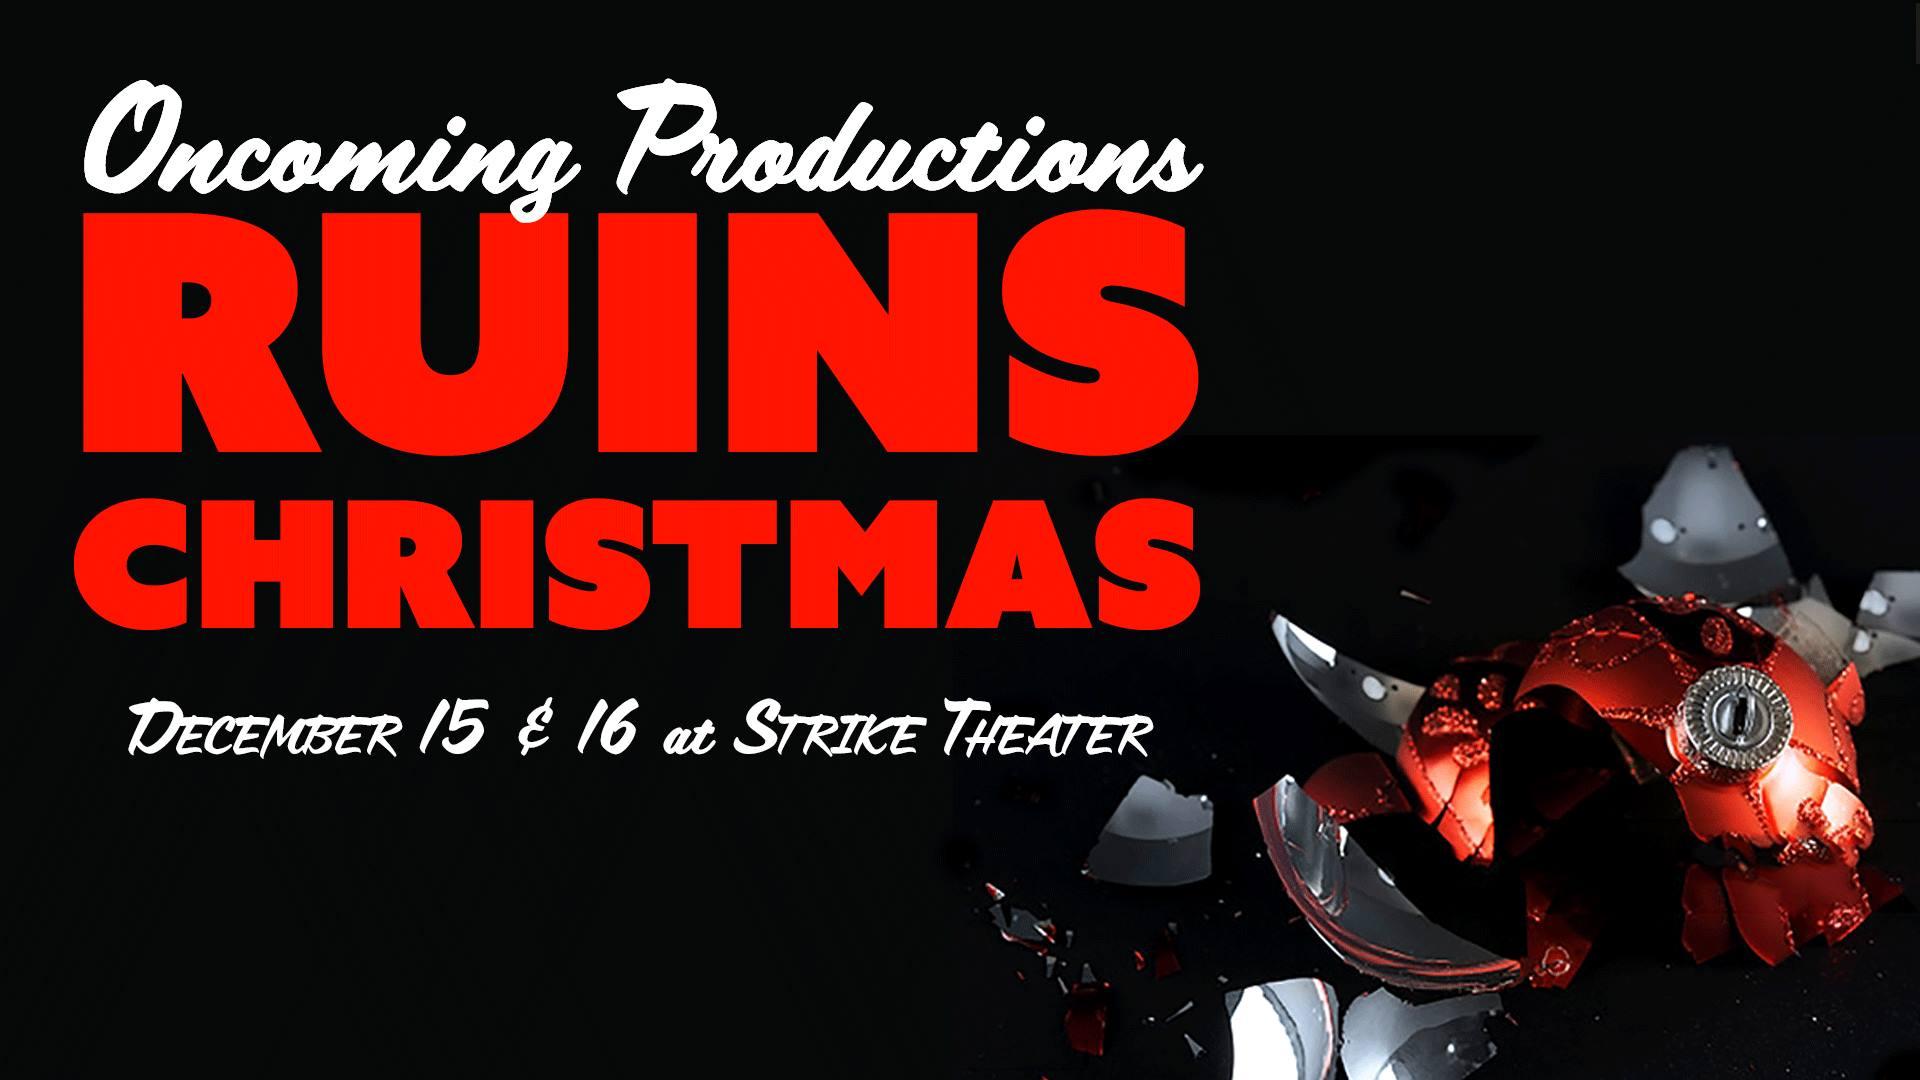 Oncoming Productions Ruins Christmas